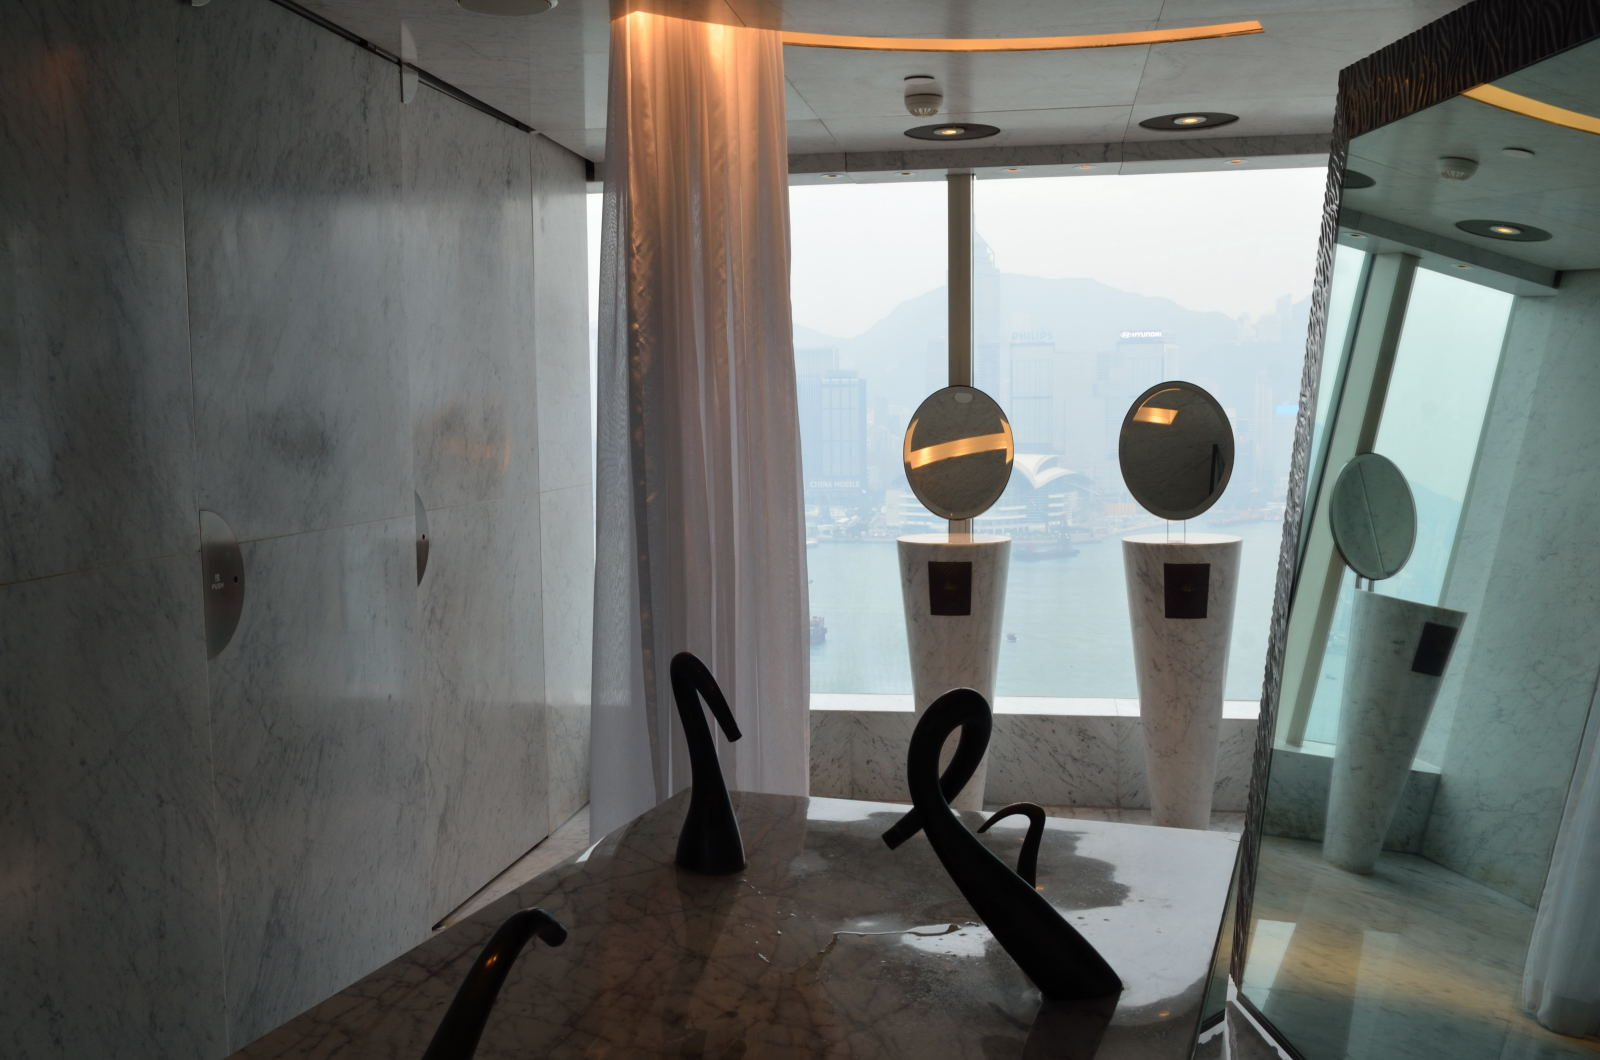 FELIX The Peninsula Hong Kong glamorous restaurant  : Felix Peninsula007 from www.asia-bars.com size 1600 x 1060 jpeg 179kB